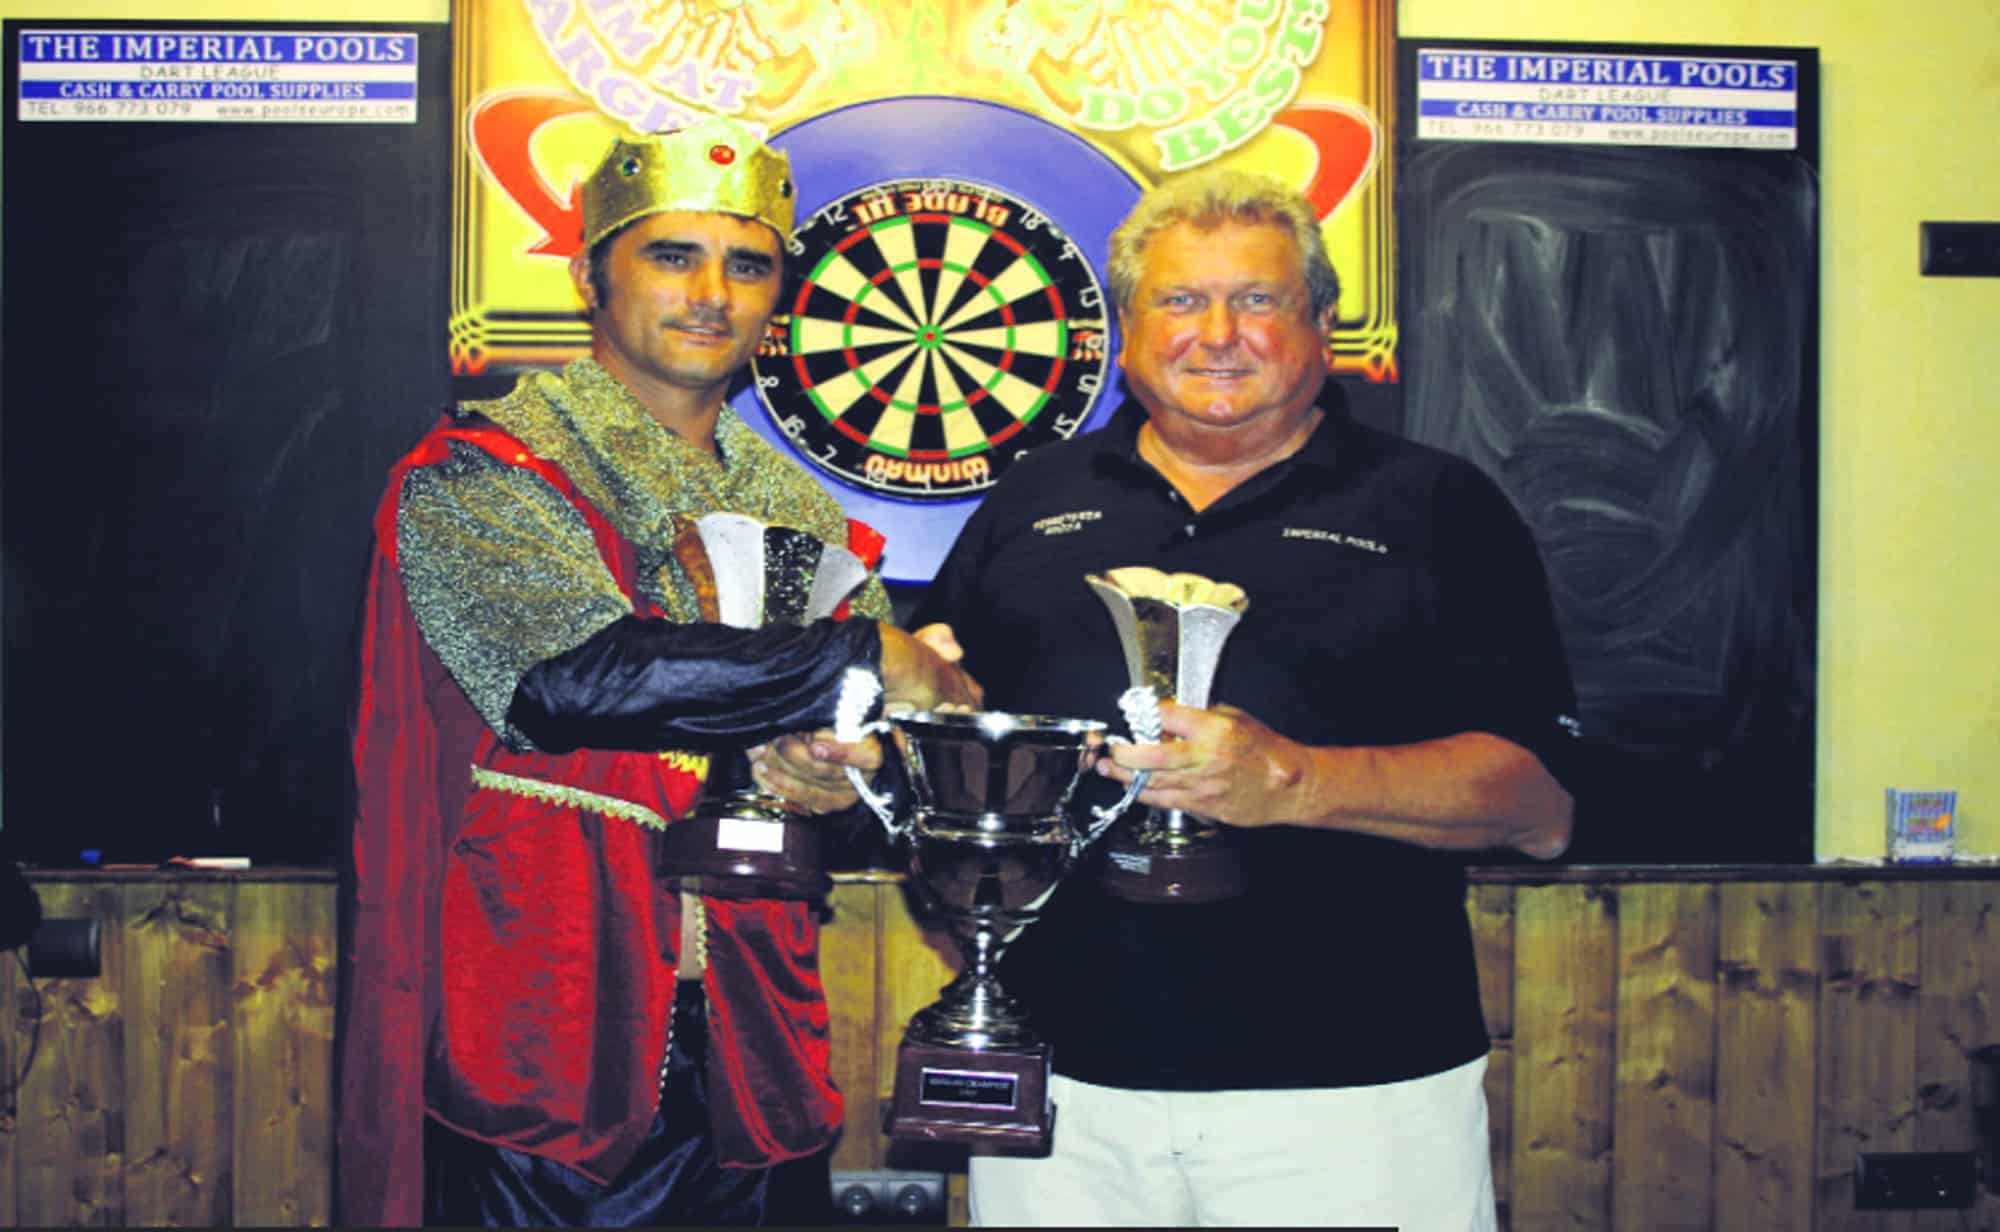 Singles finalists Farmer and Durrant